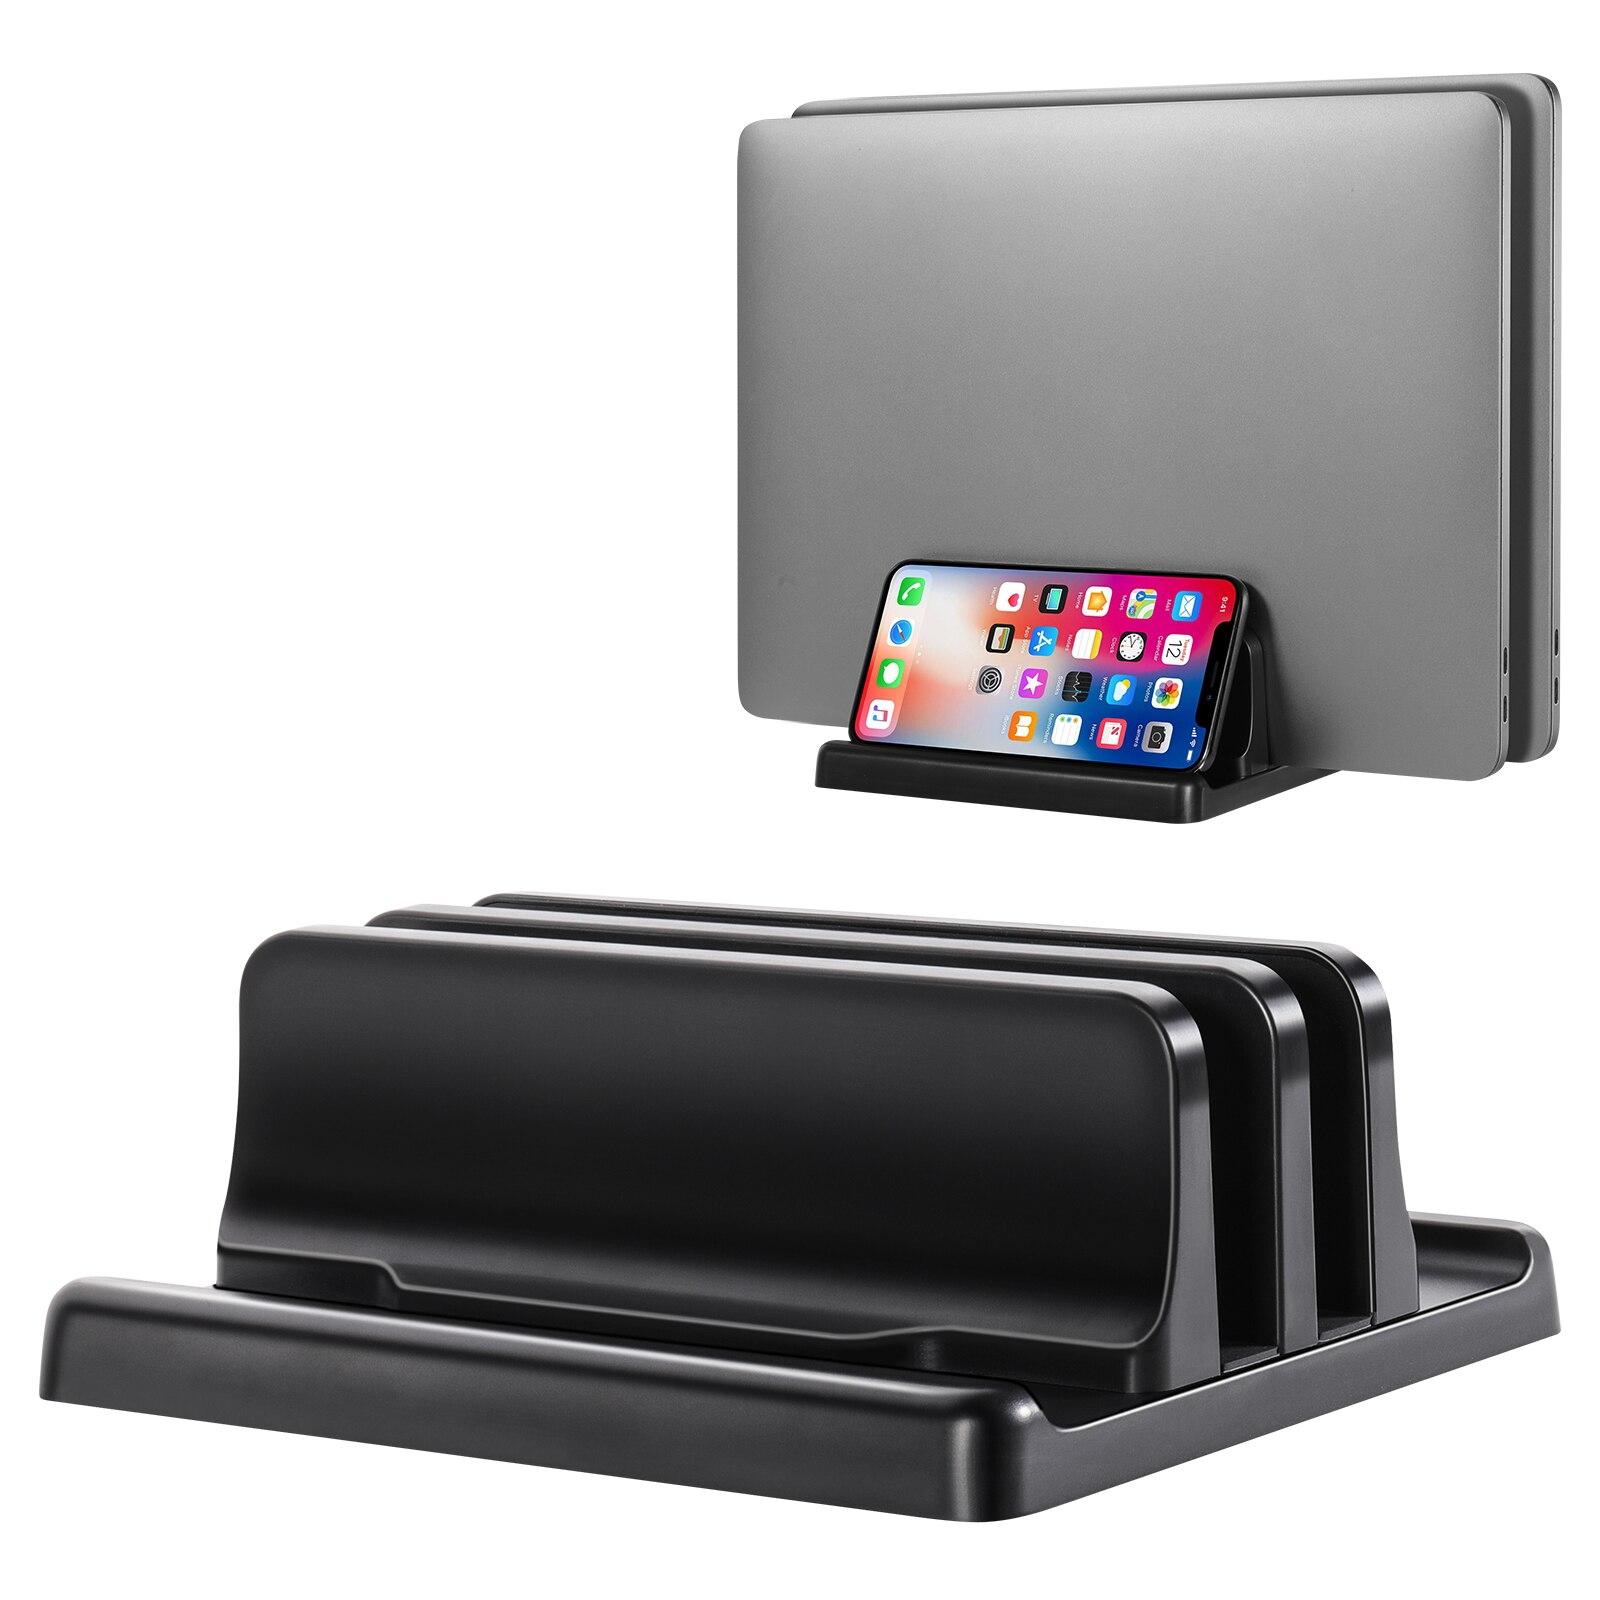 Vertical Laptop Stand Holder Plastic Adjustable Desktop Notebook Dock Space-Saving 3 In 1